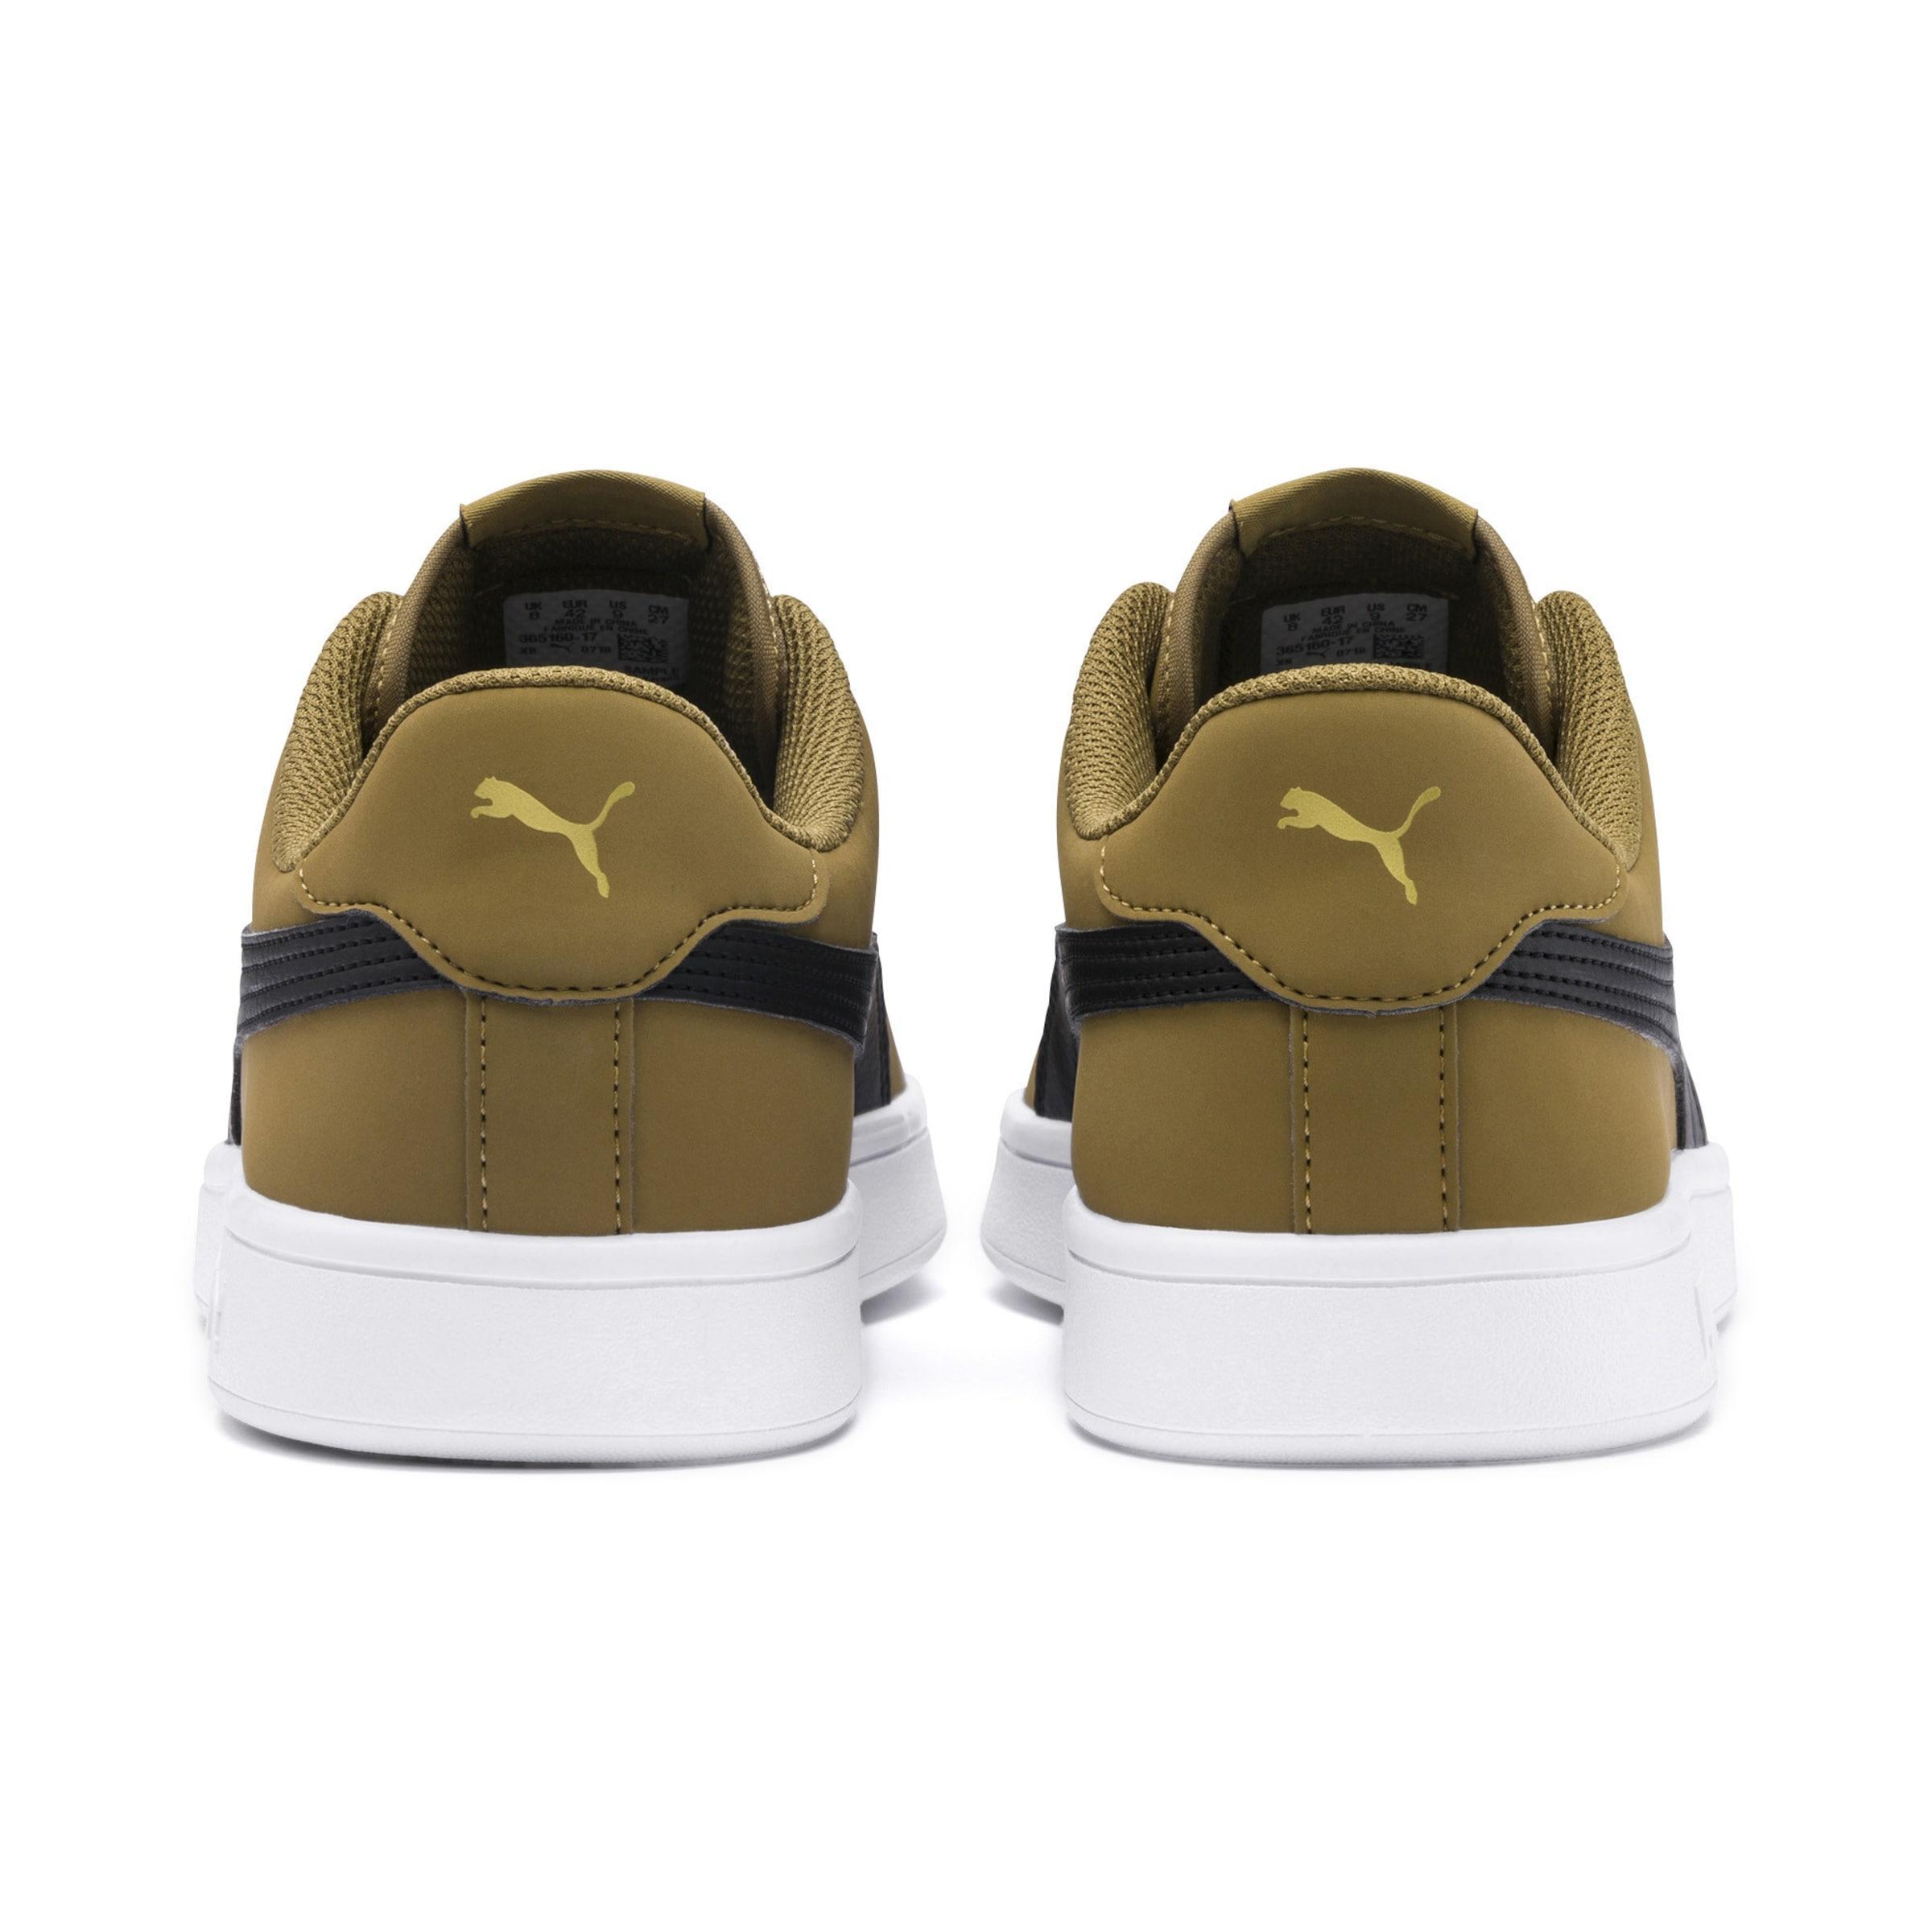 Puma In Sneaker V2 Buck' OlivSchwarz 'smash 3c4LqSA5Rj